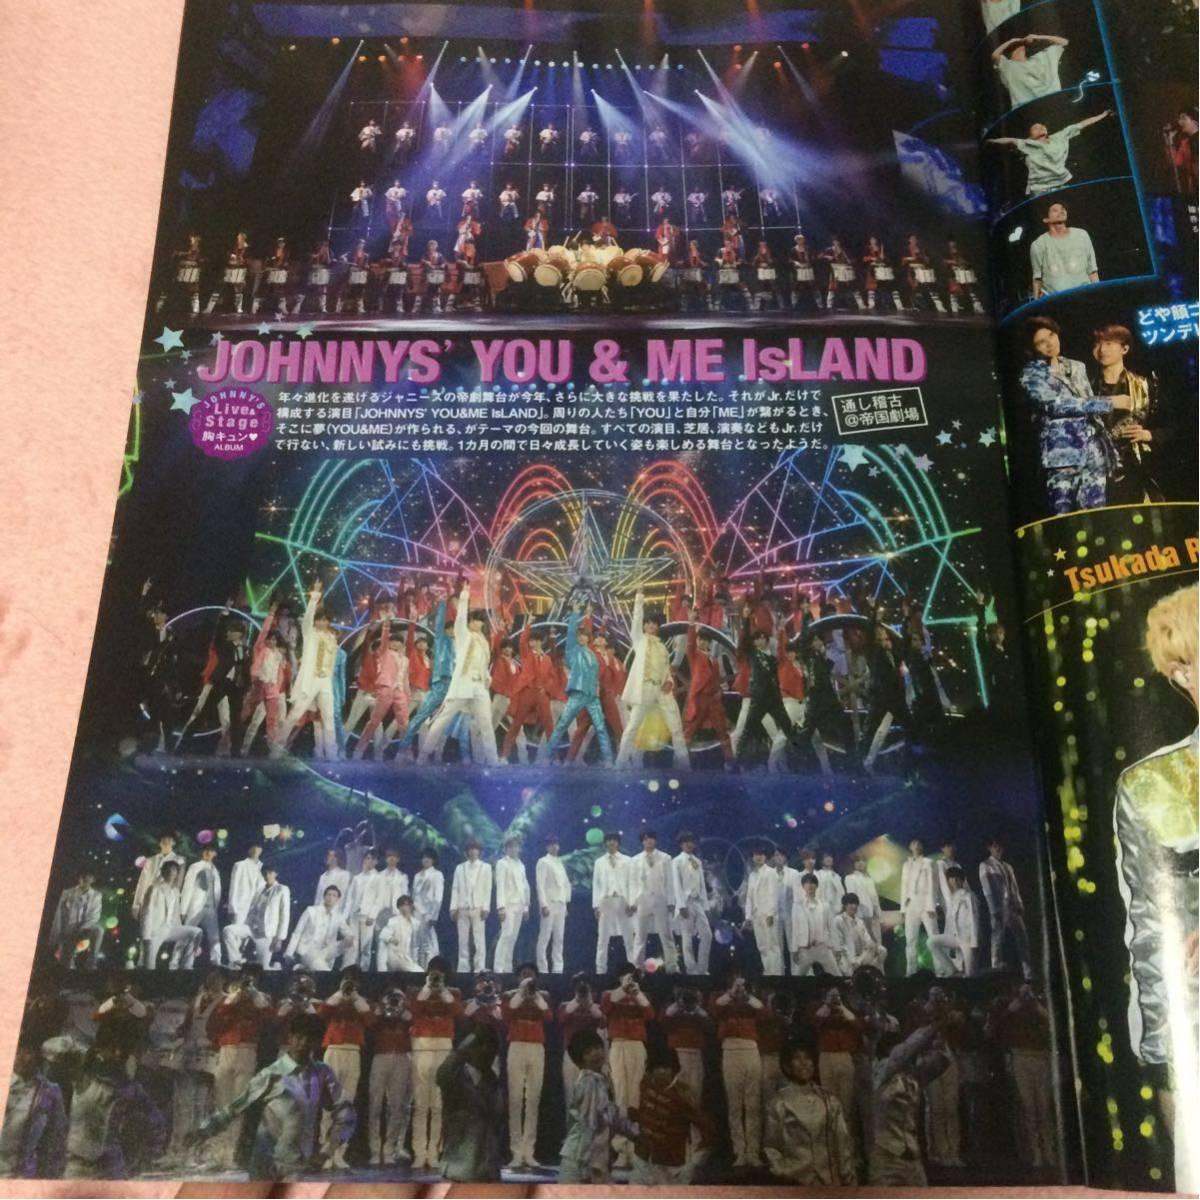 TVnavi SMILE ジャニーズJr Mr.KING Prince HiHi Jet 東京B少年 Love-tune Travis Japan 切り抜き